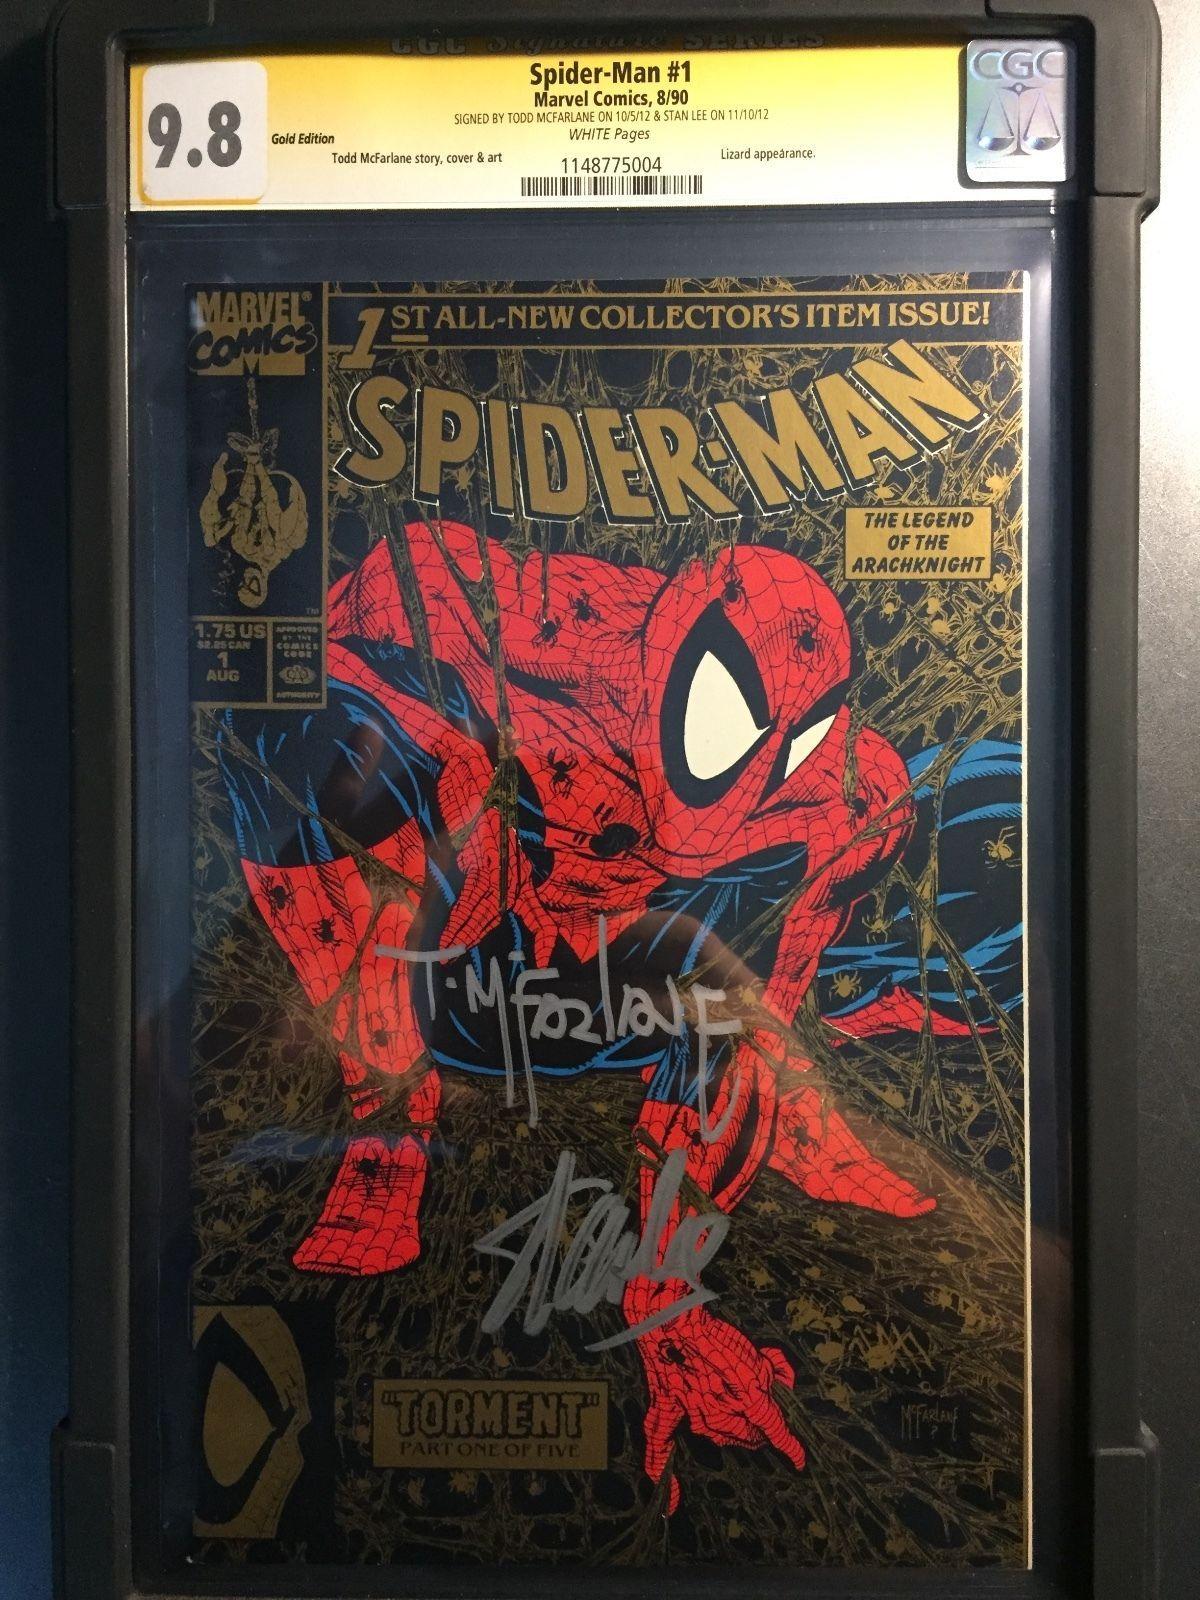 certified #graded #cgc #cpgx #art #DC #Marvel #comic Marvel